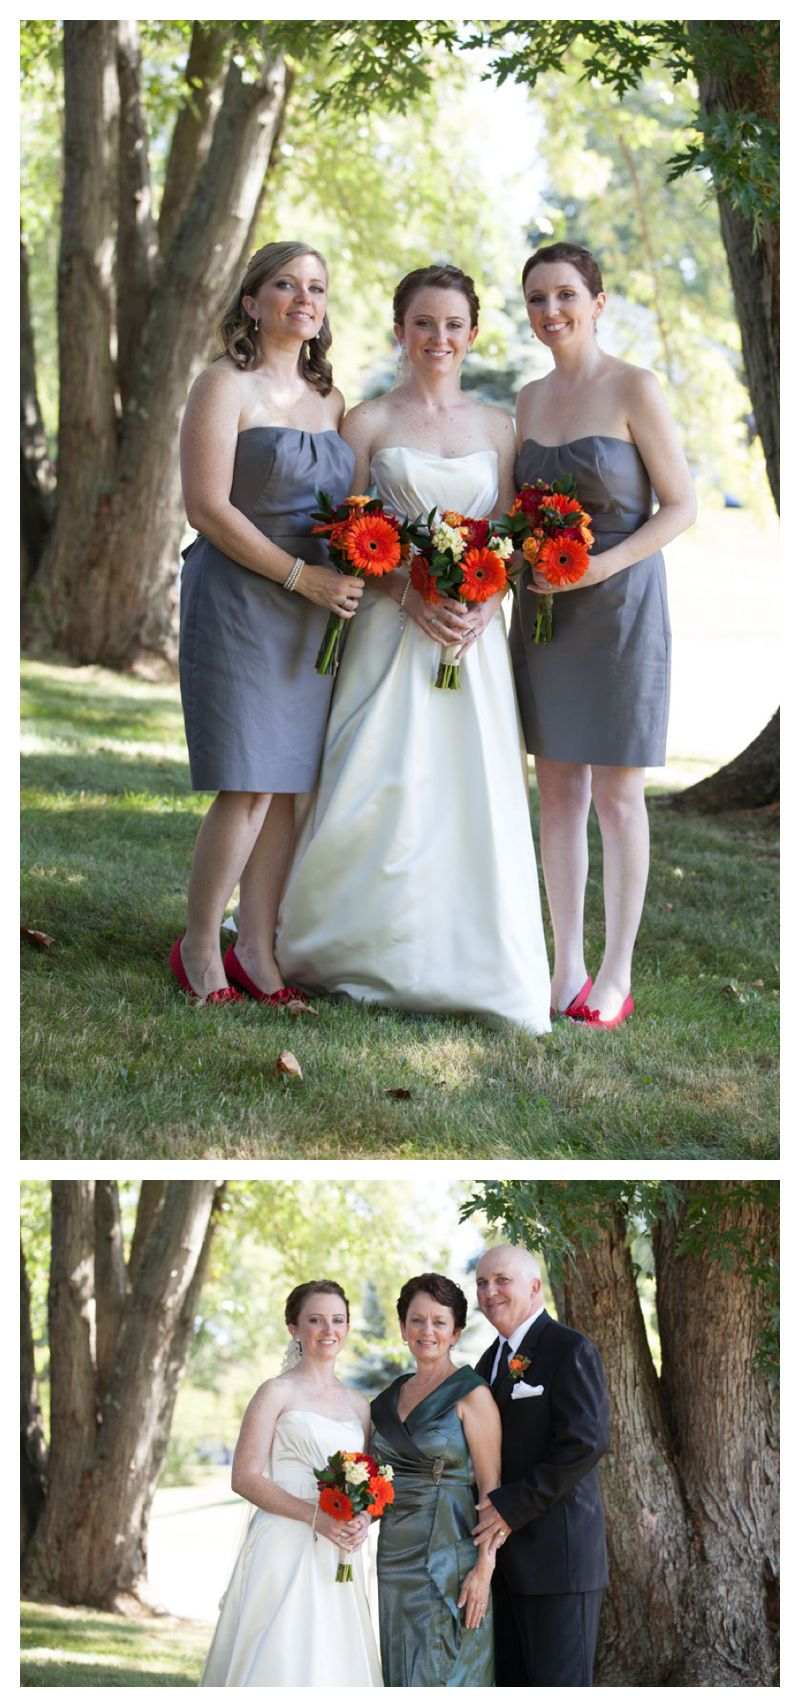 Middletown NY wedding photographer